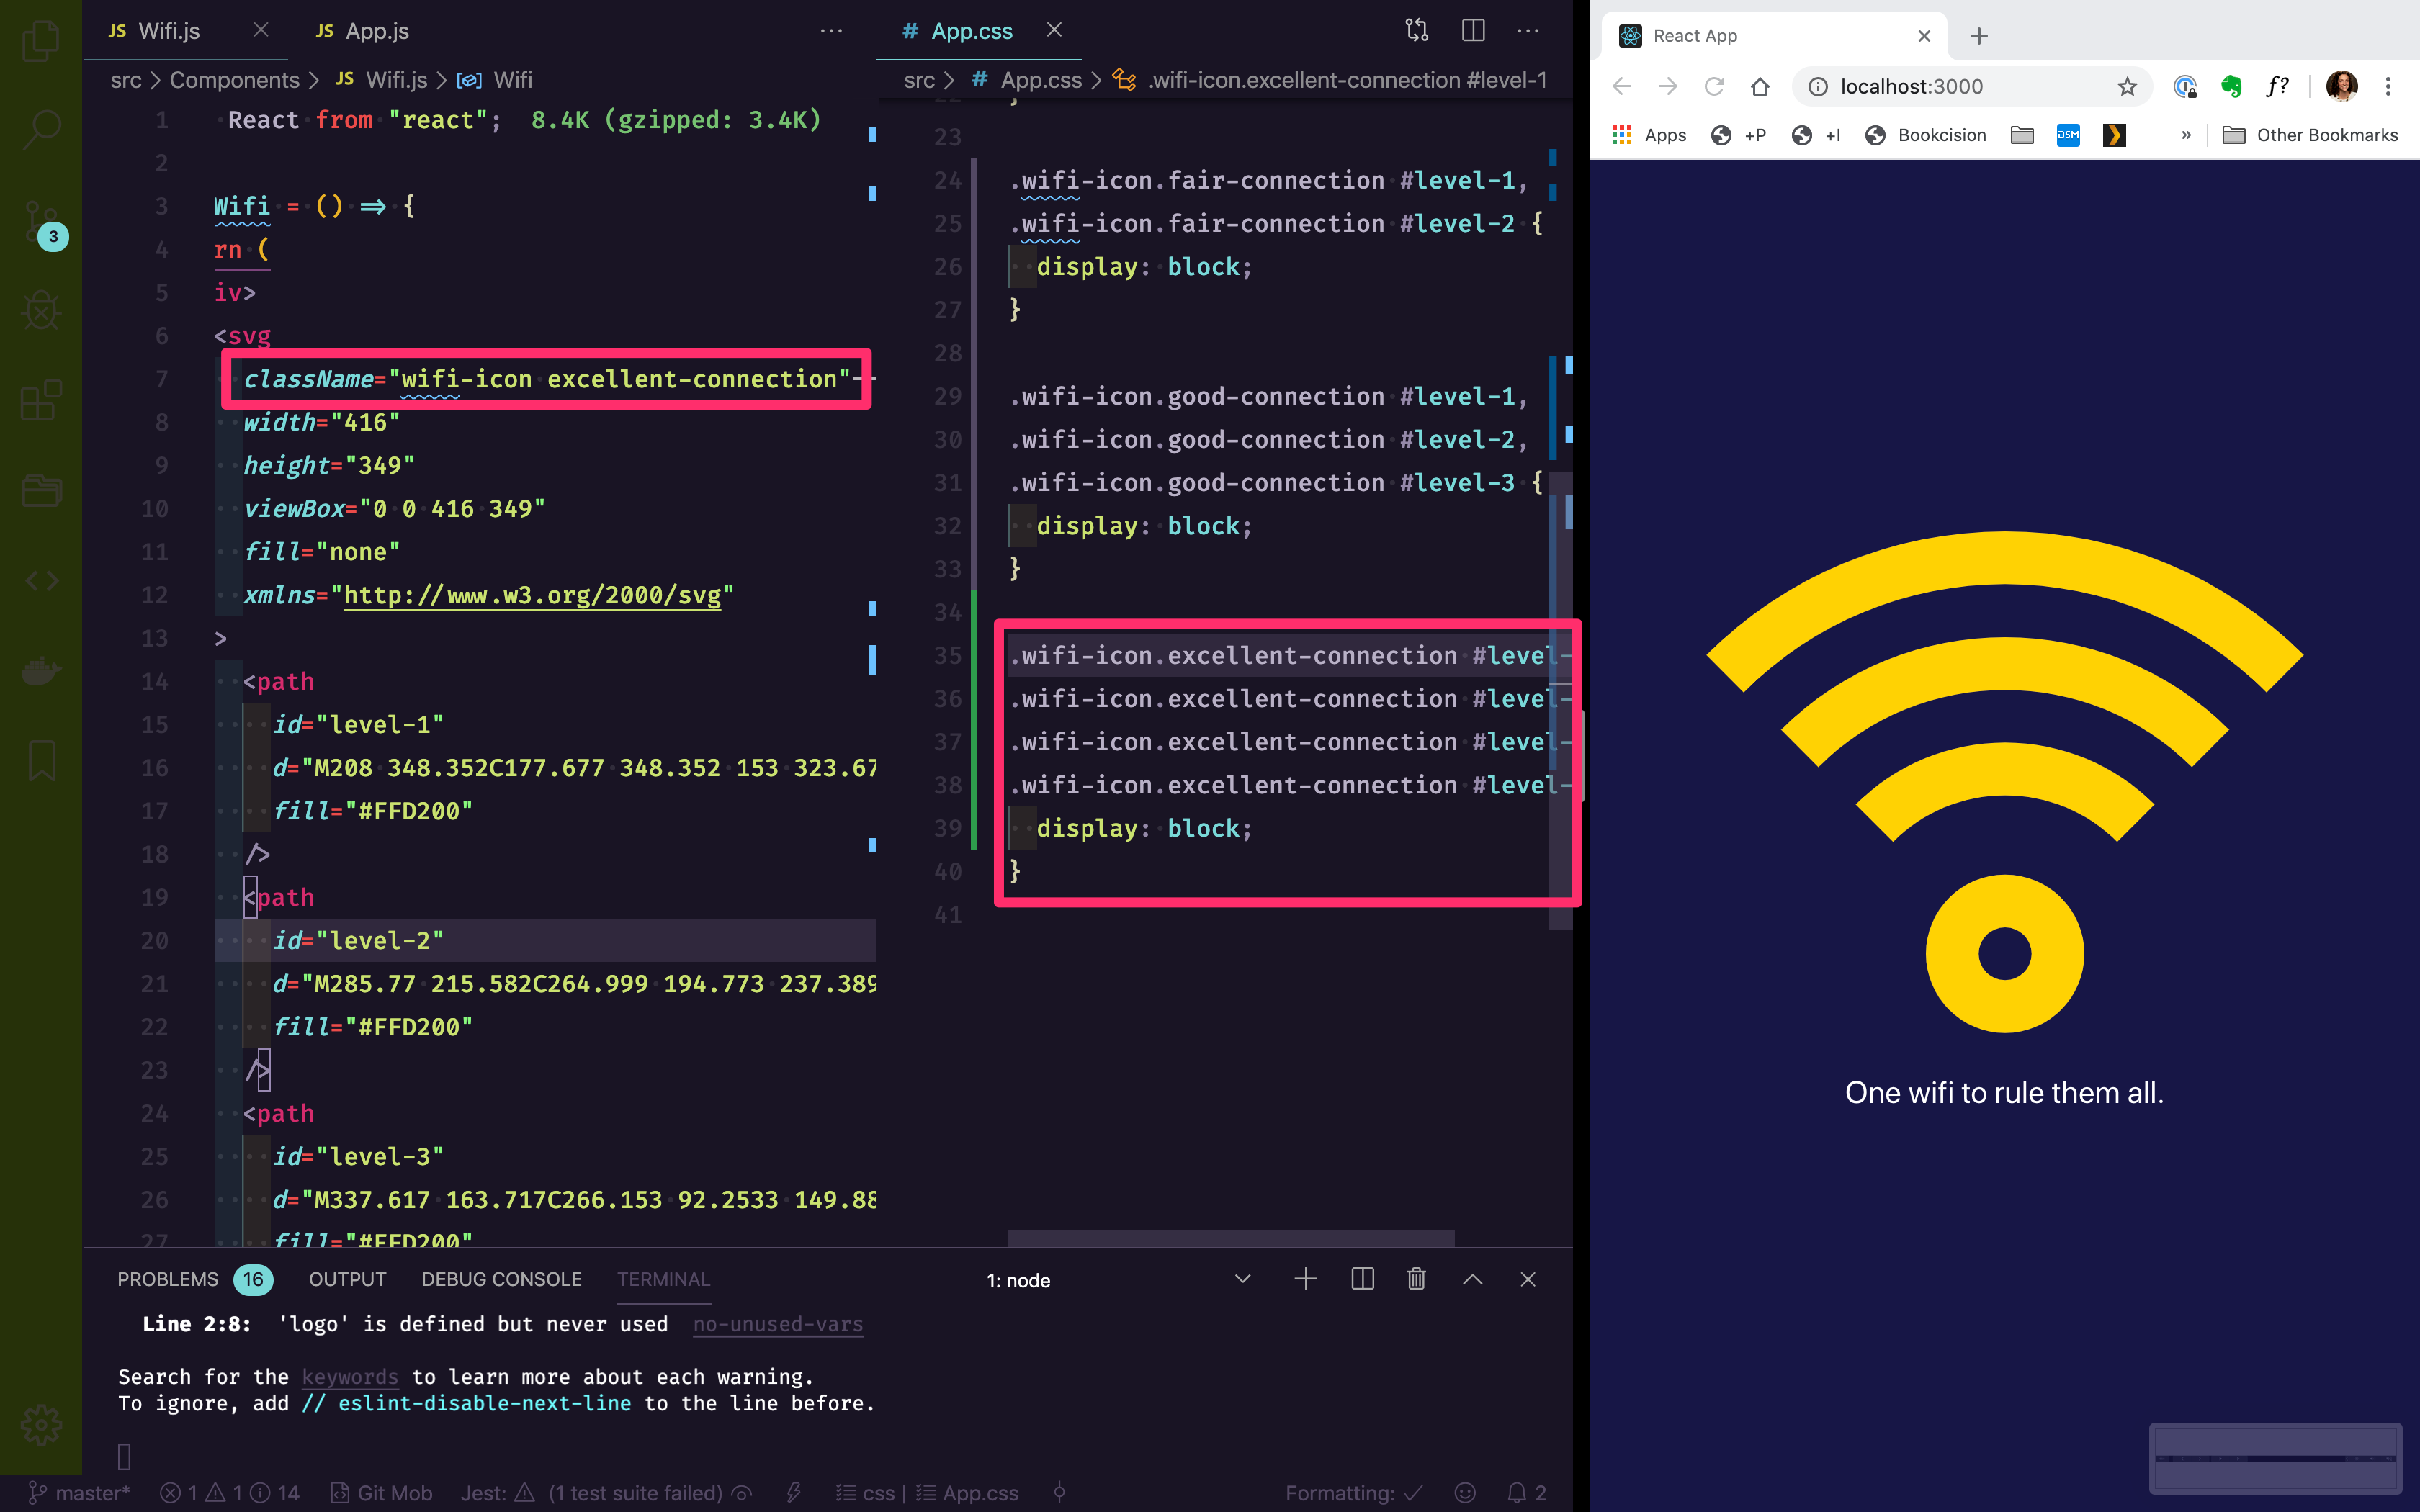 Wifi Excellent Connection